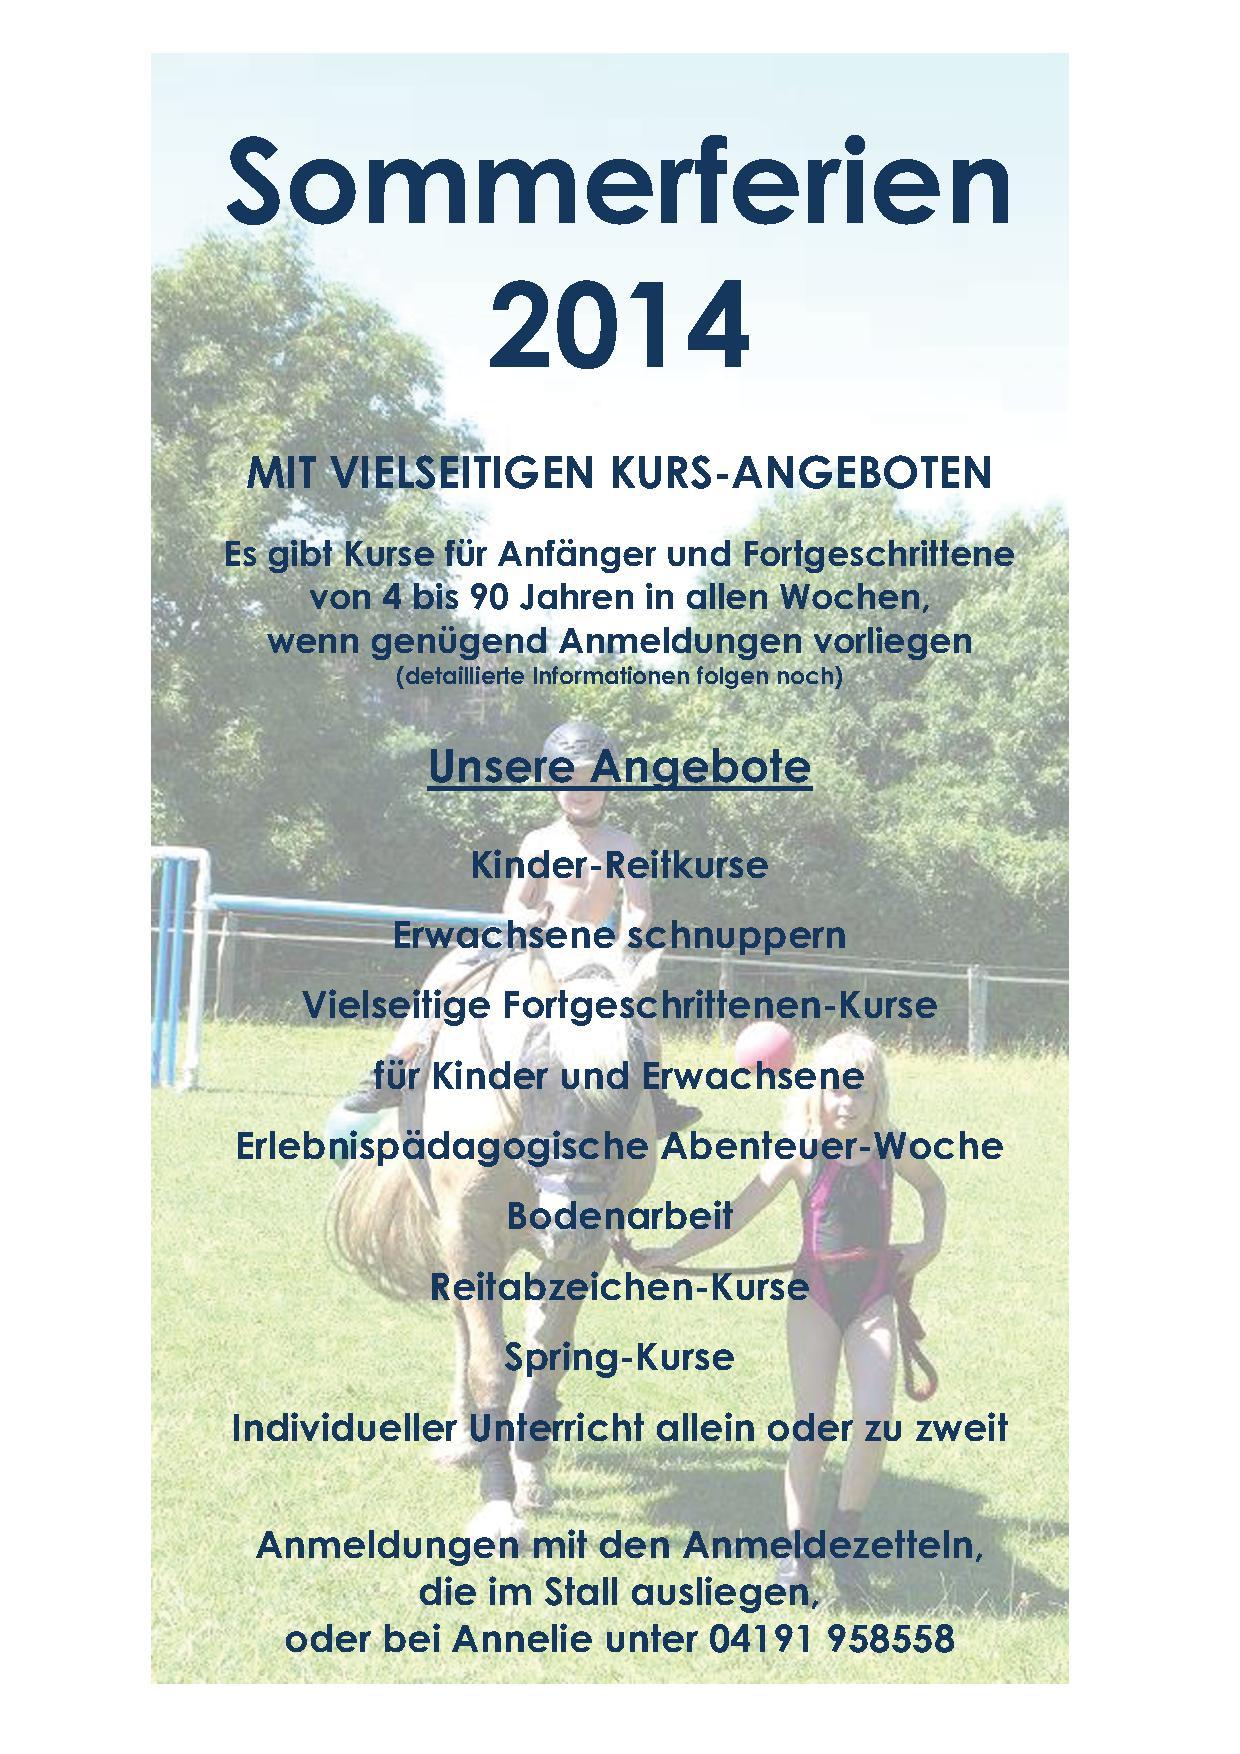 Sommerferien 2014